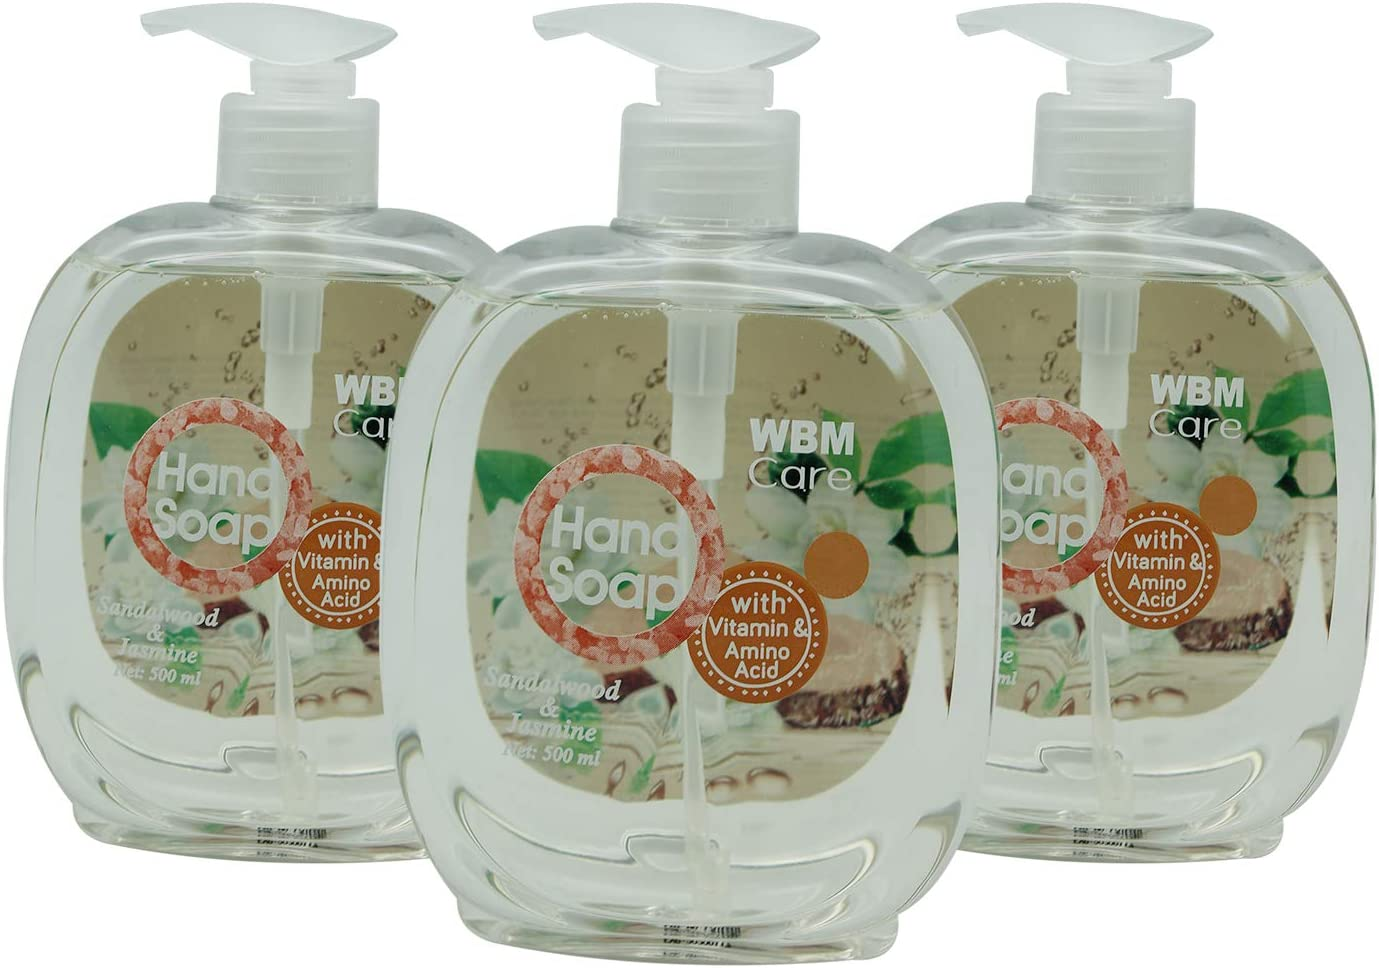 WBM Care Natural Liquid Hand Soap,Sandalwood & Jasmine,16.9 Oz (3-Pack)